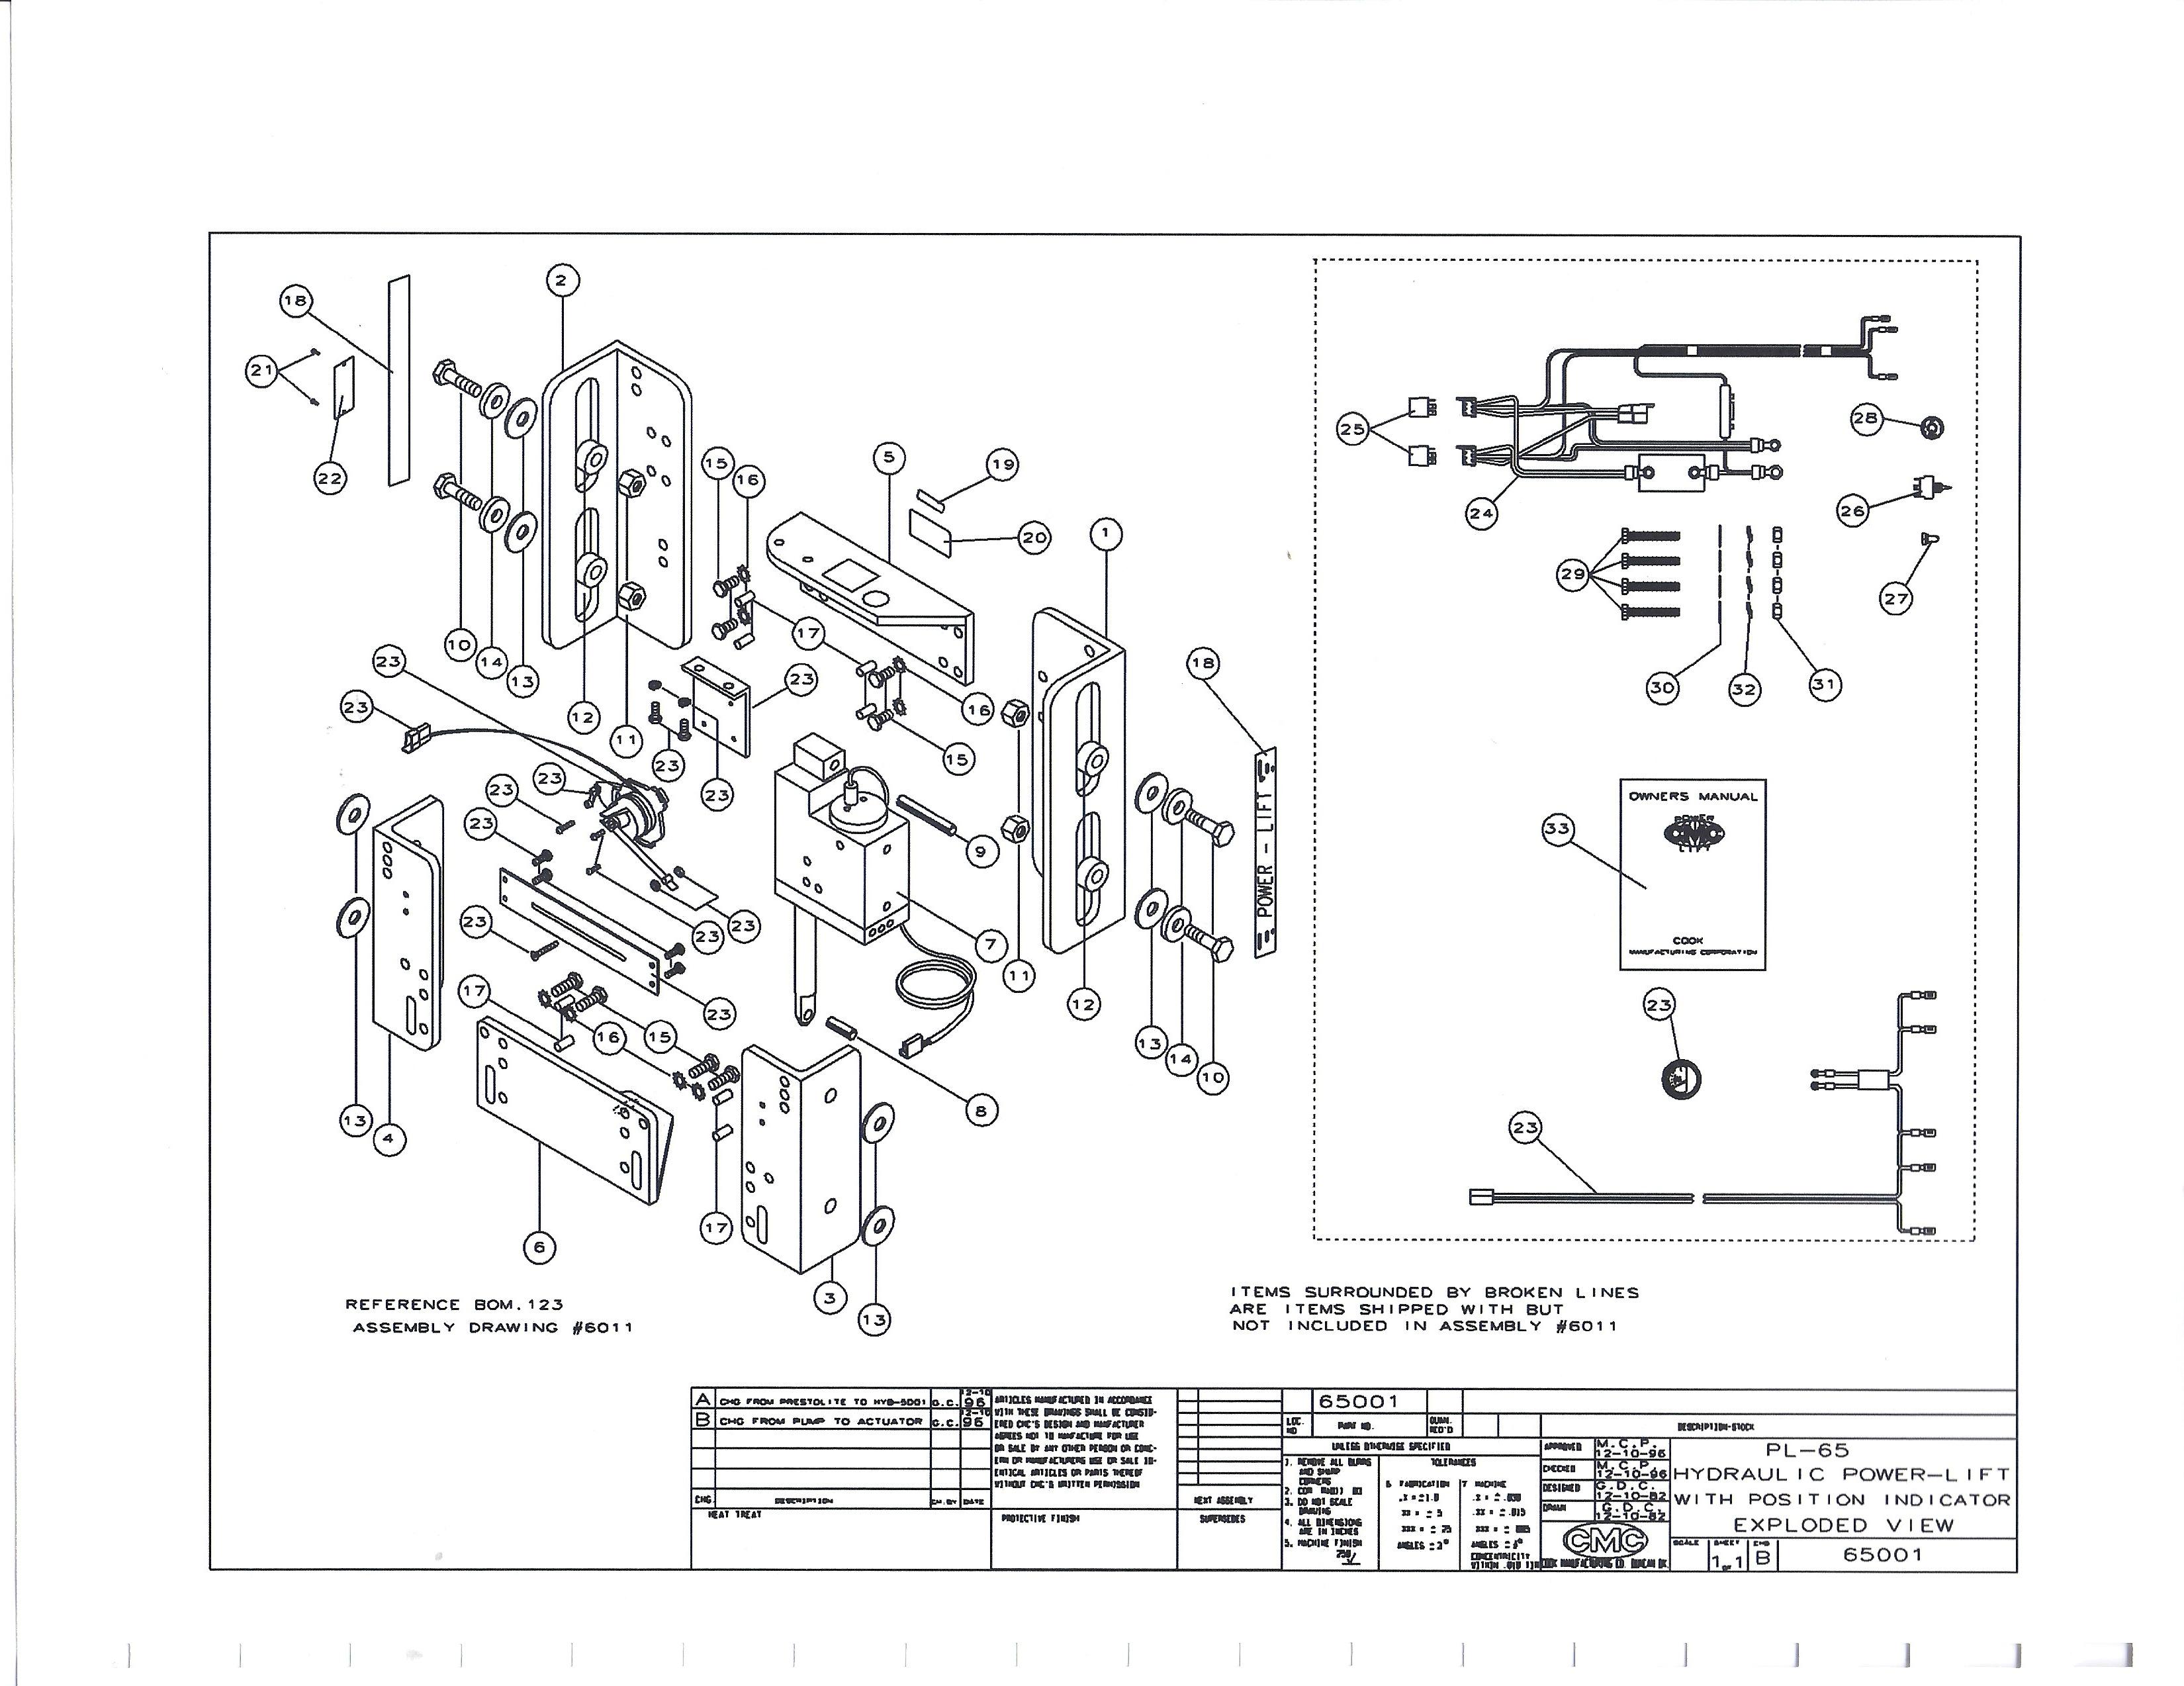 cmc jack plate wiring diagram 5 pin round plug atlas hydraulic harness 10 slide master